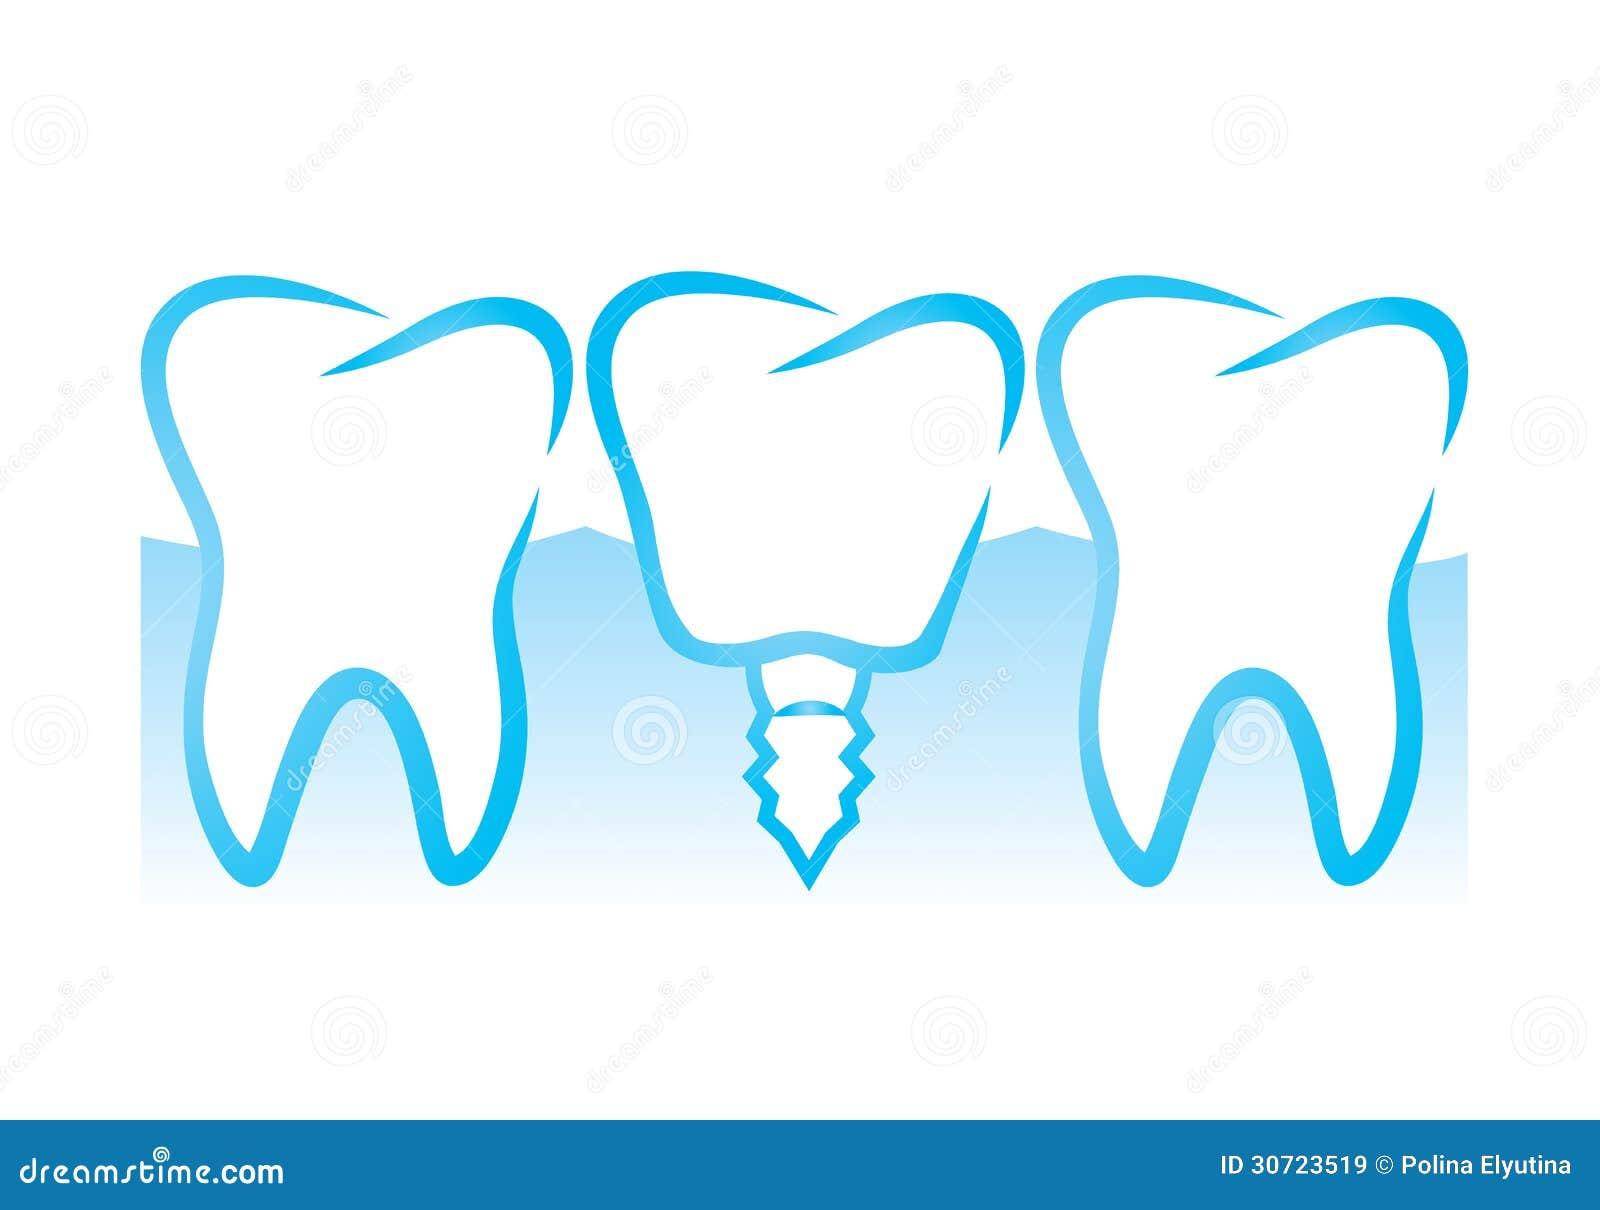 dentist clipart vector - photo #40